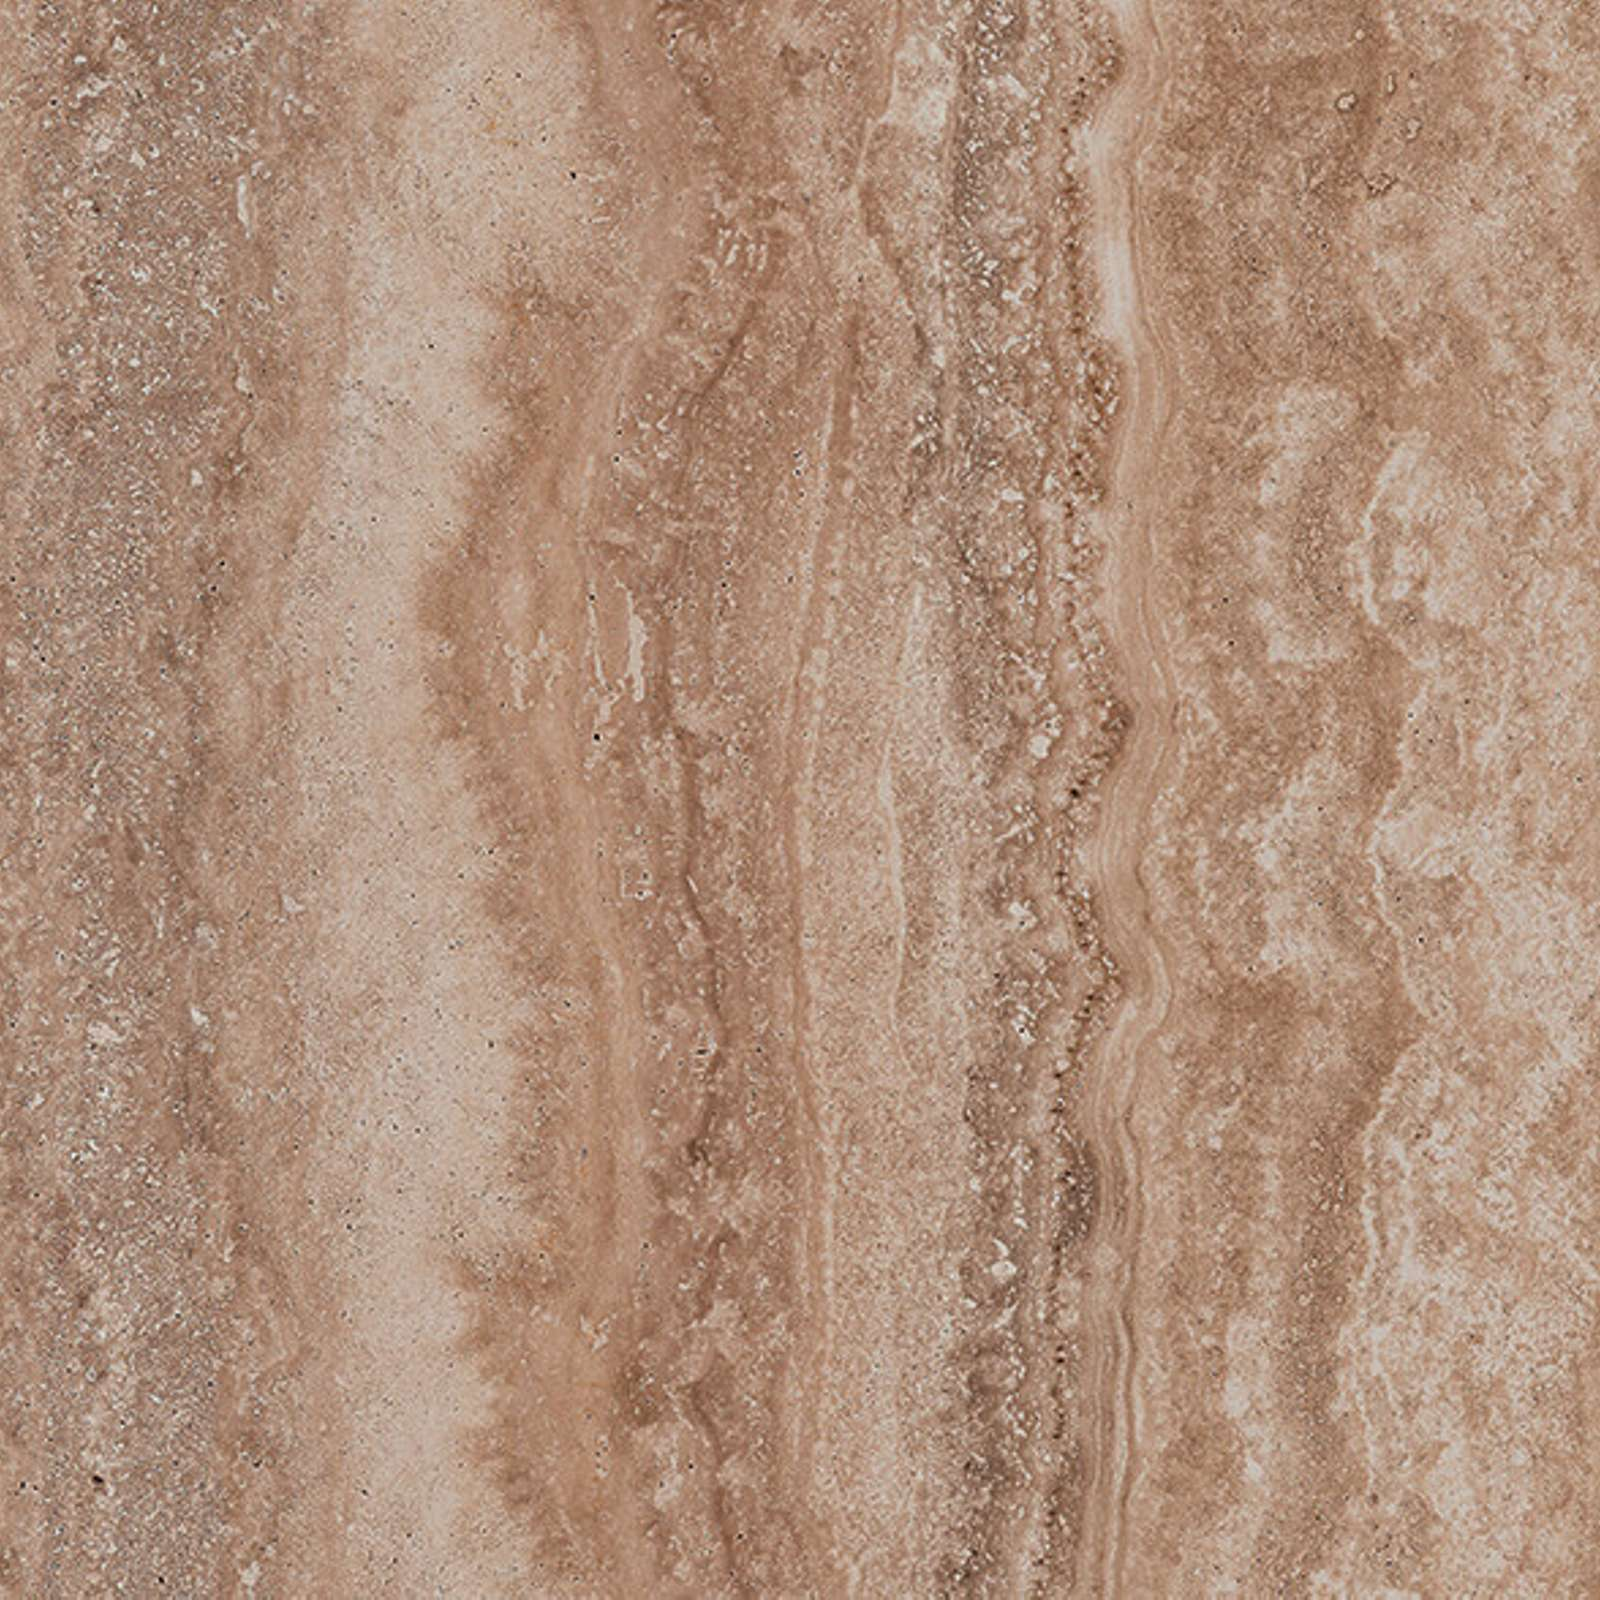 Керамогранит Амбуаз беж обрезной DL900300R, 300х300х11 мм, Kerama Marazzi